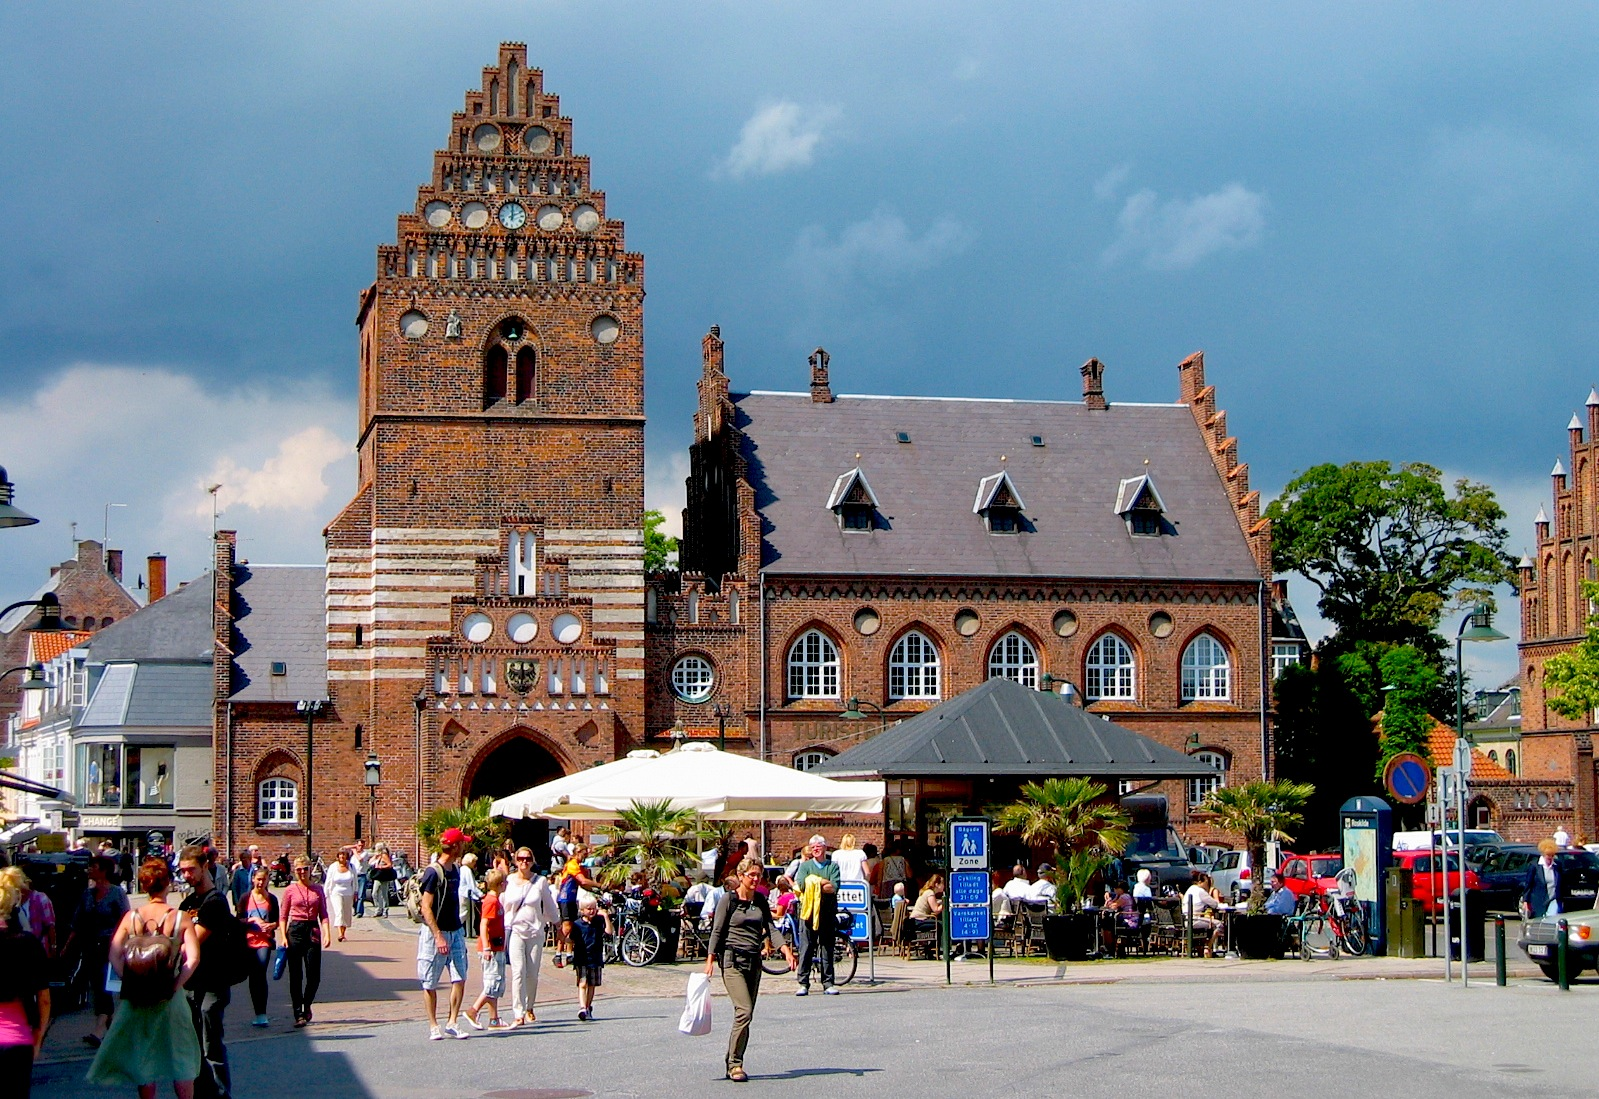 Roskilde Rathaus